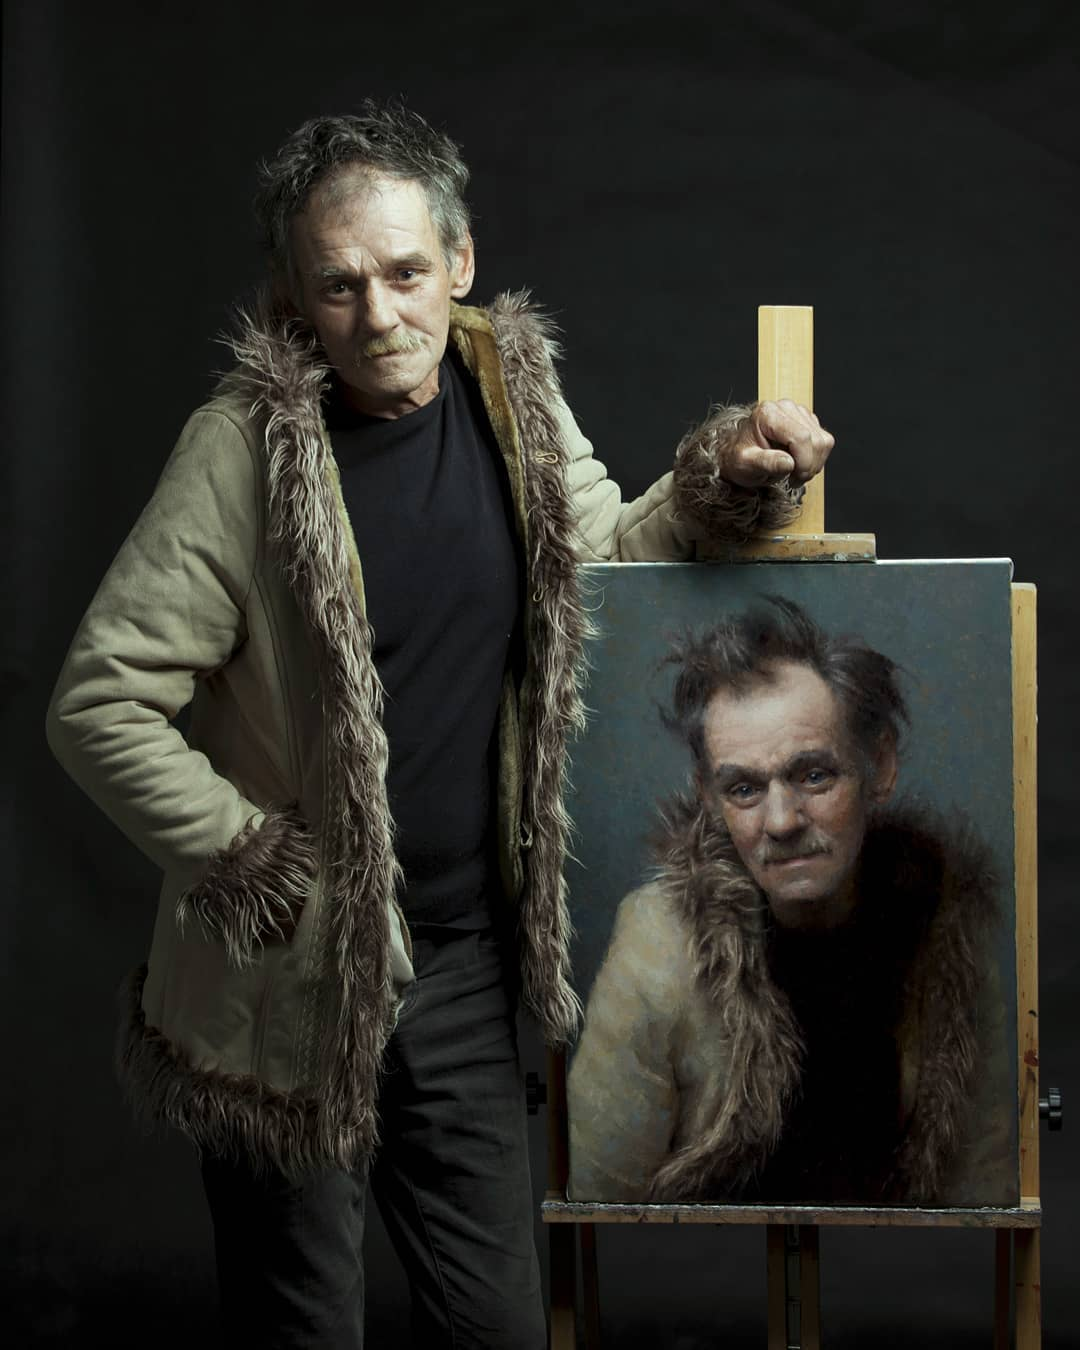 Realistic Portraits by Damian Lechoszest